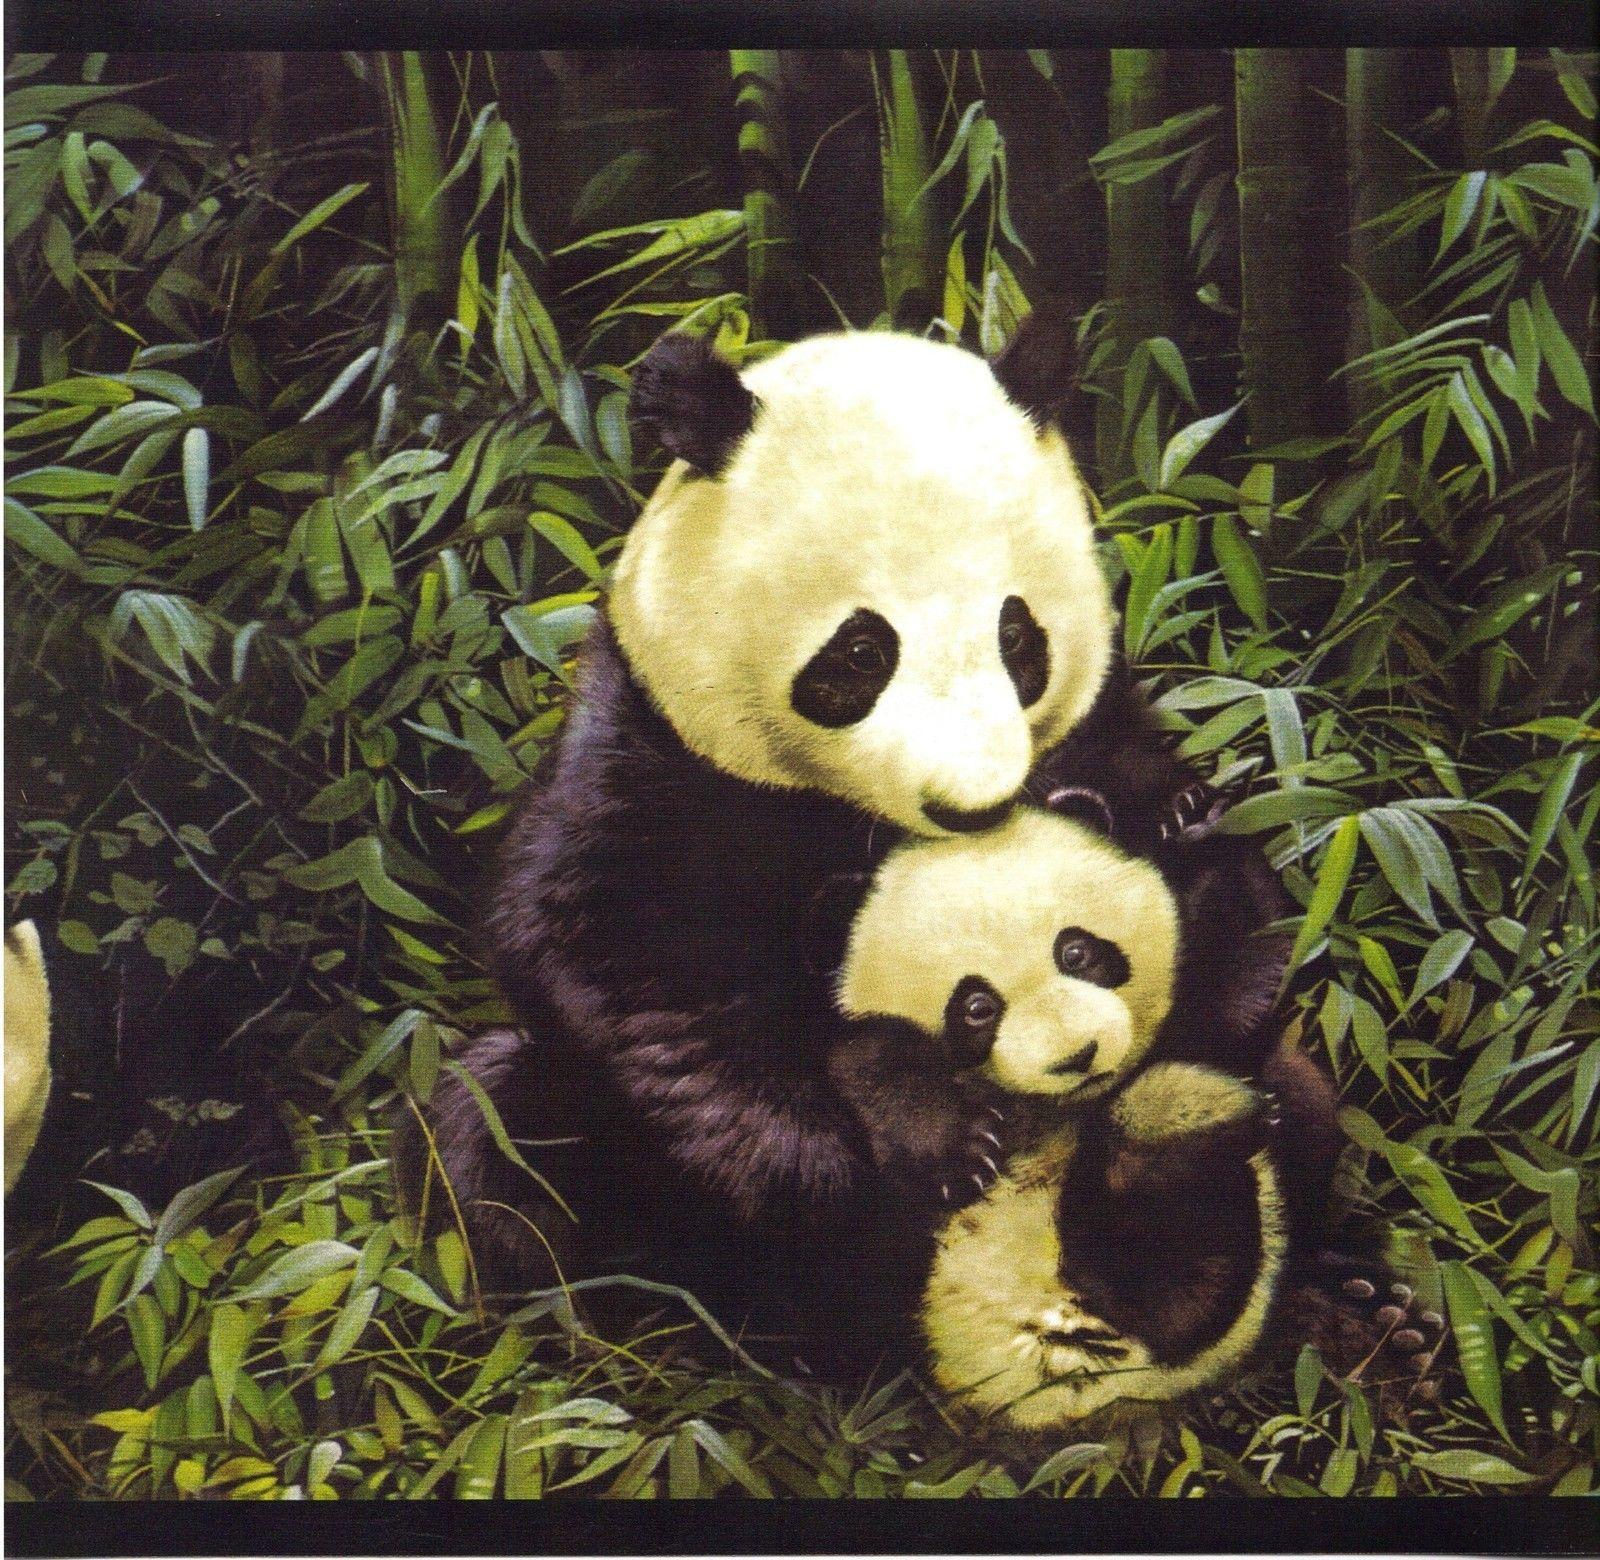 Panda bears bamboo jungle wallpaper border black bands GB9023 2B 1600x1560